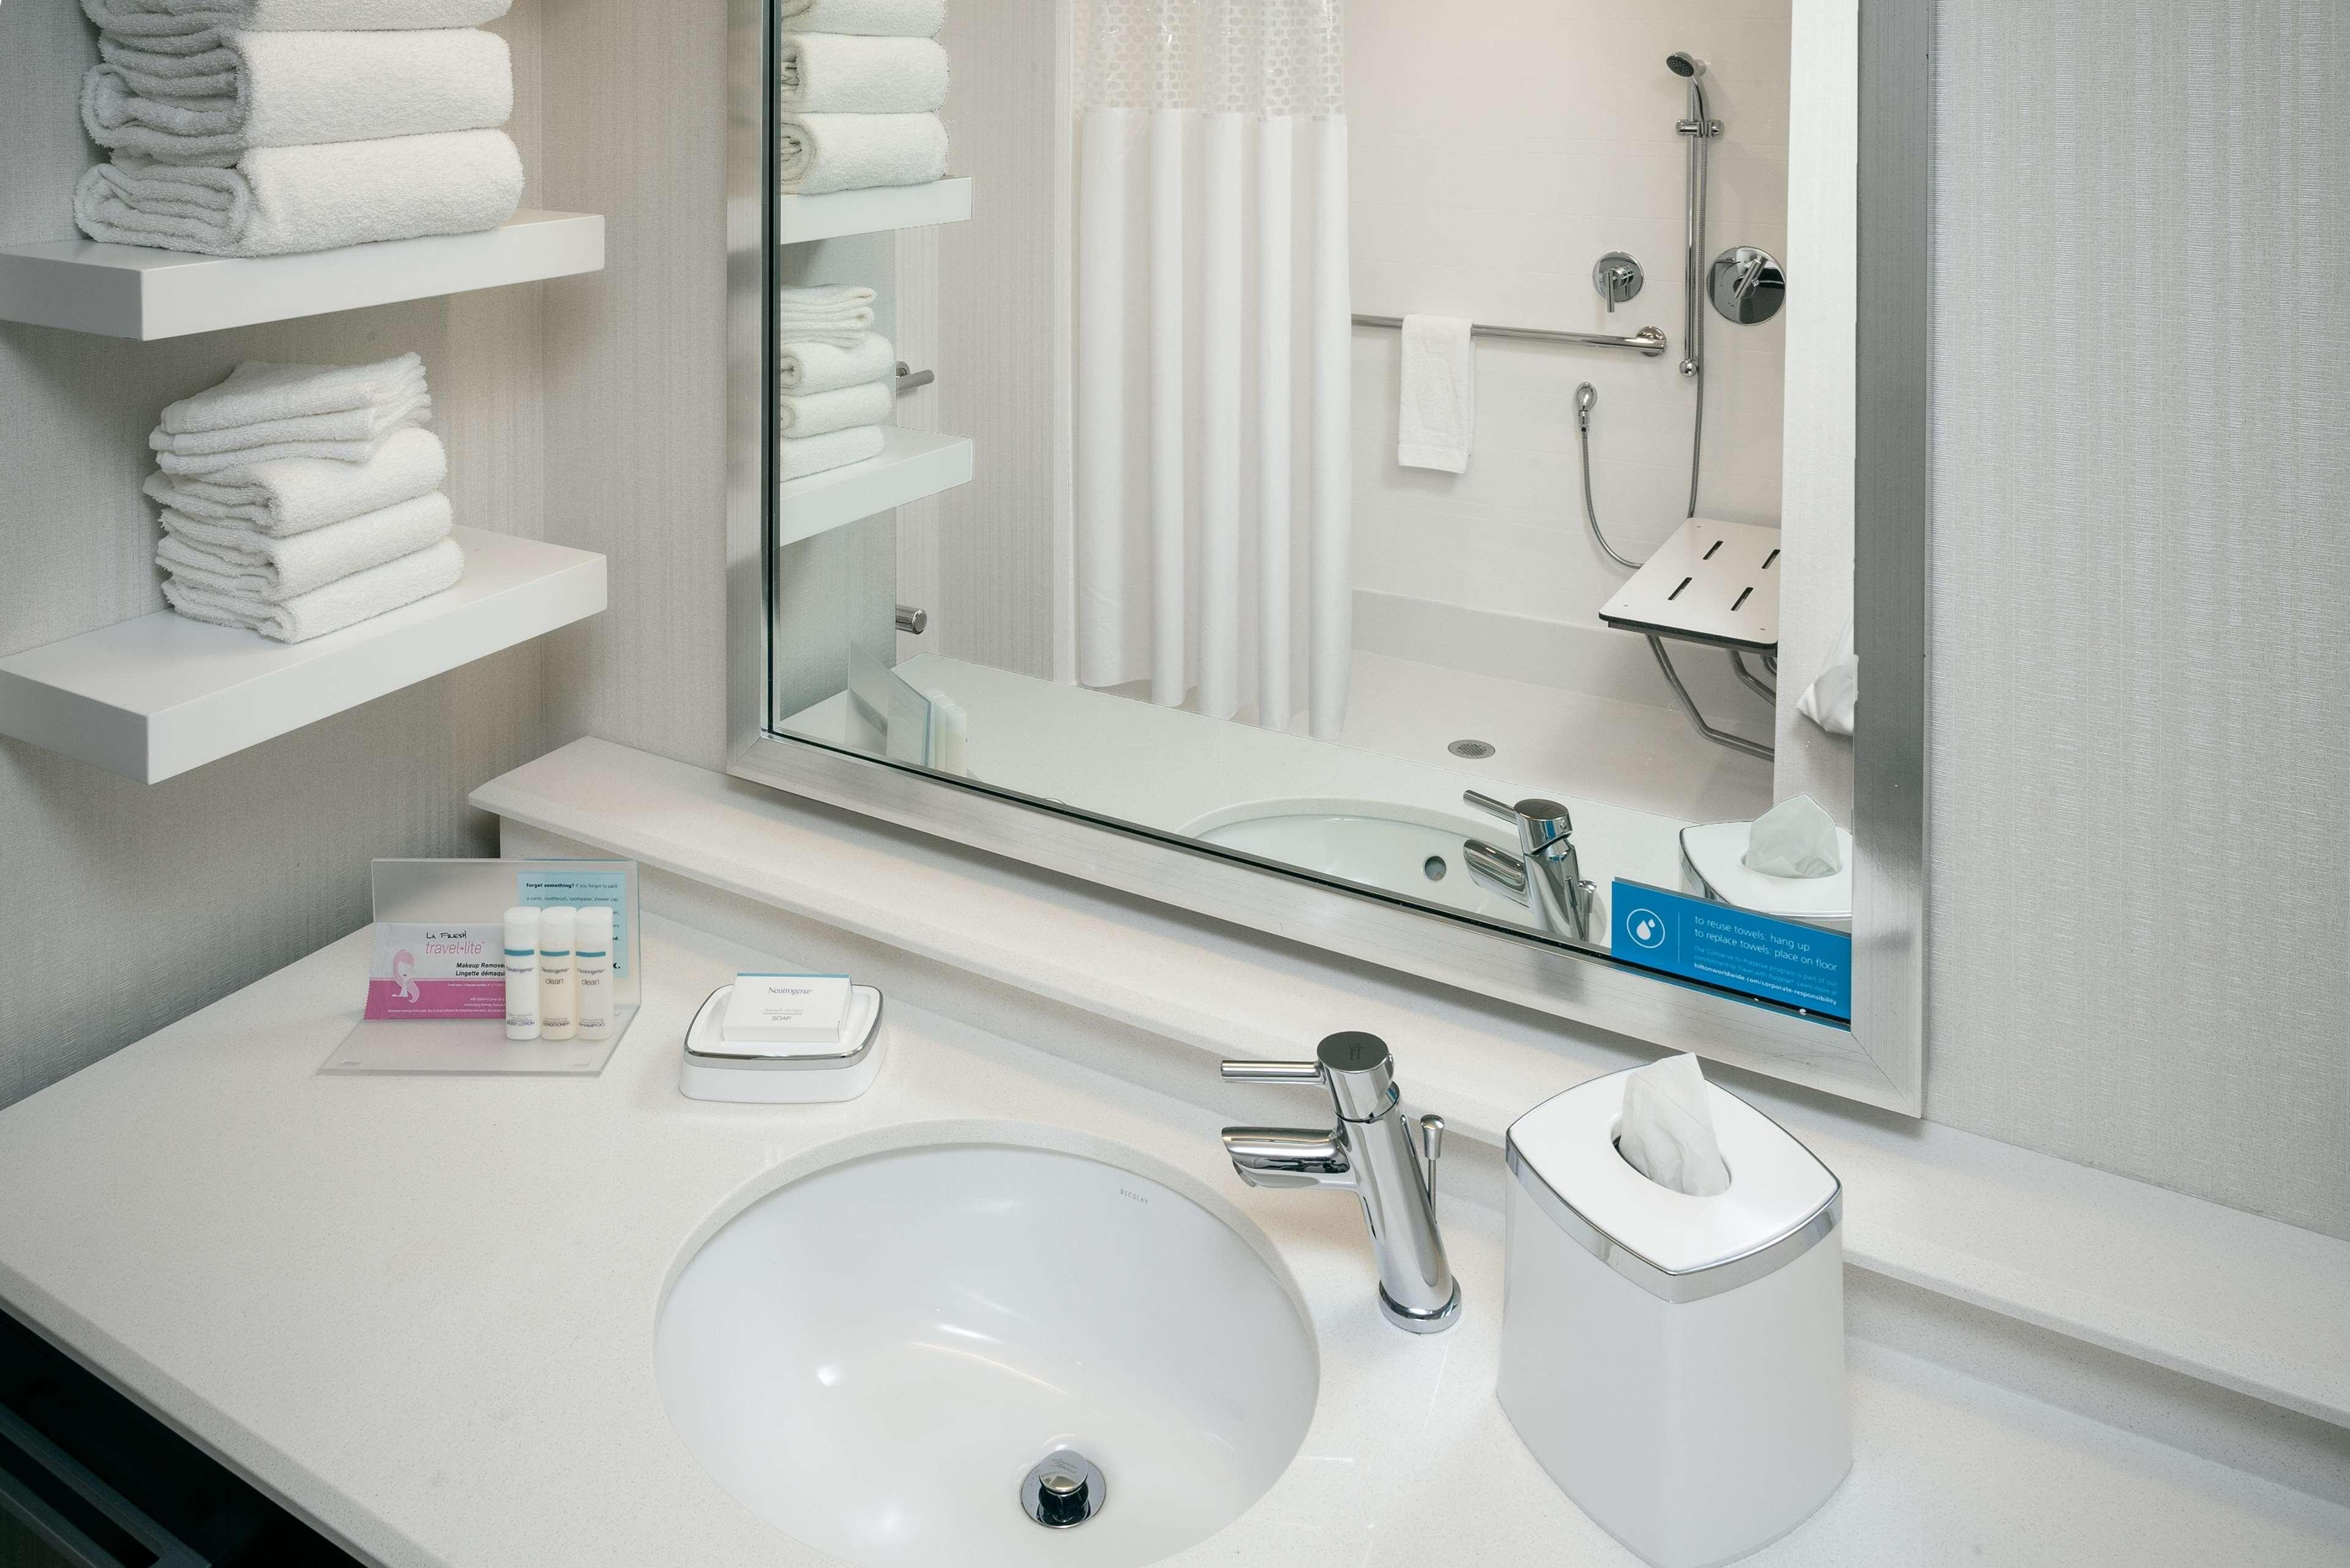 Hampton Inn & Suites by Hilton Seattle/Northgate image 16